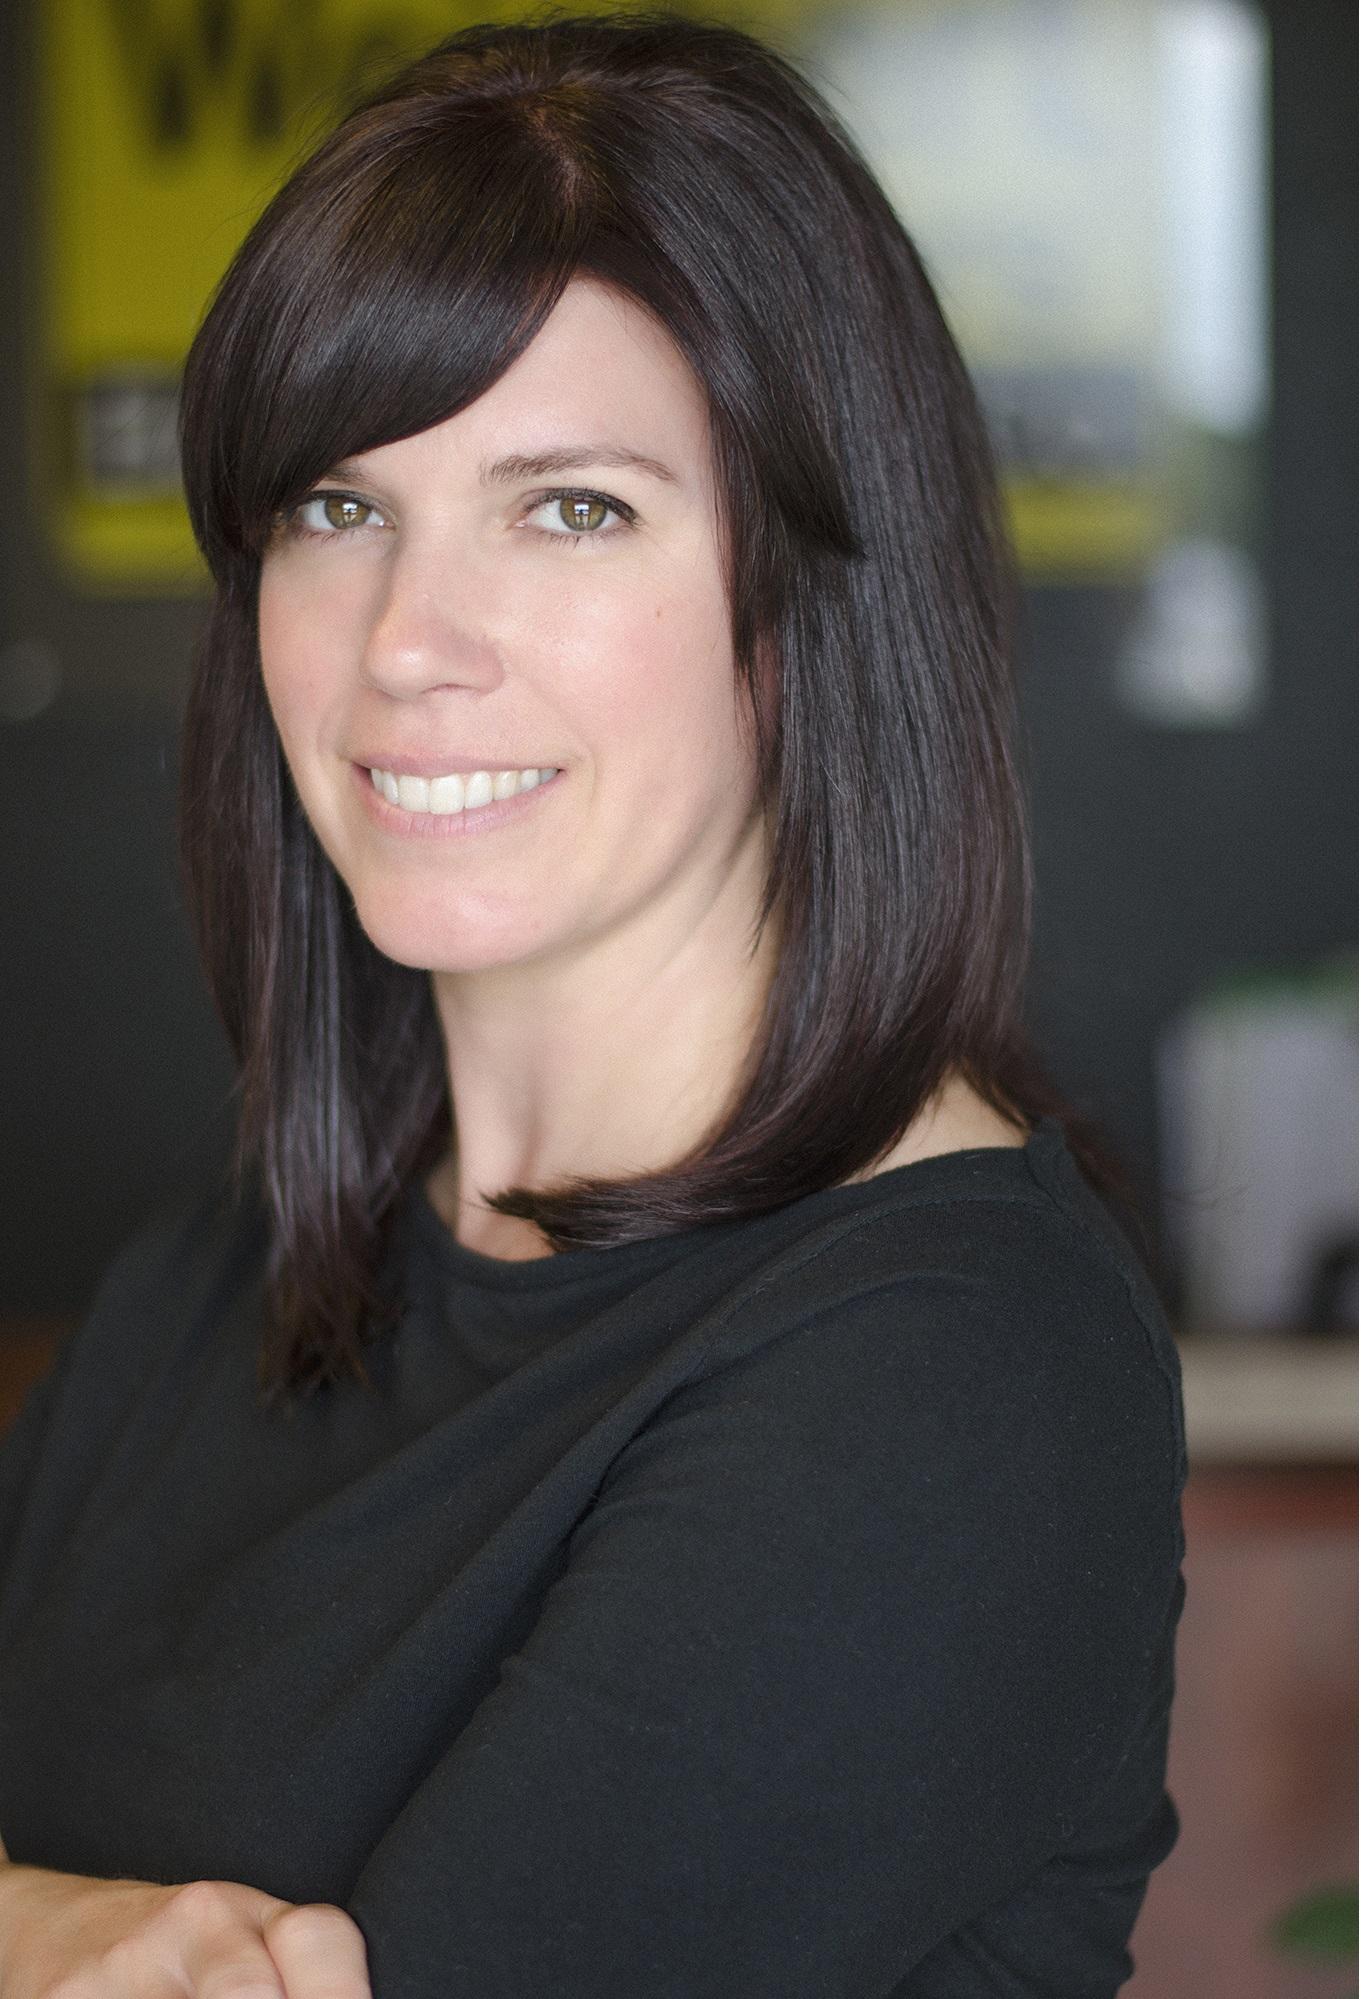 Audrey Elrod